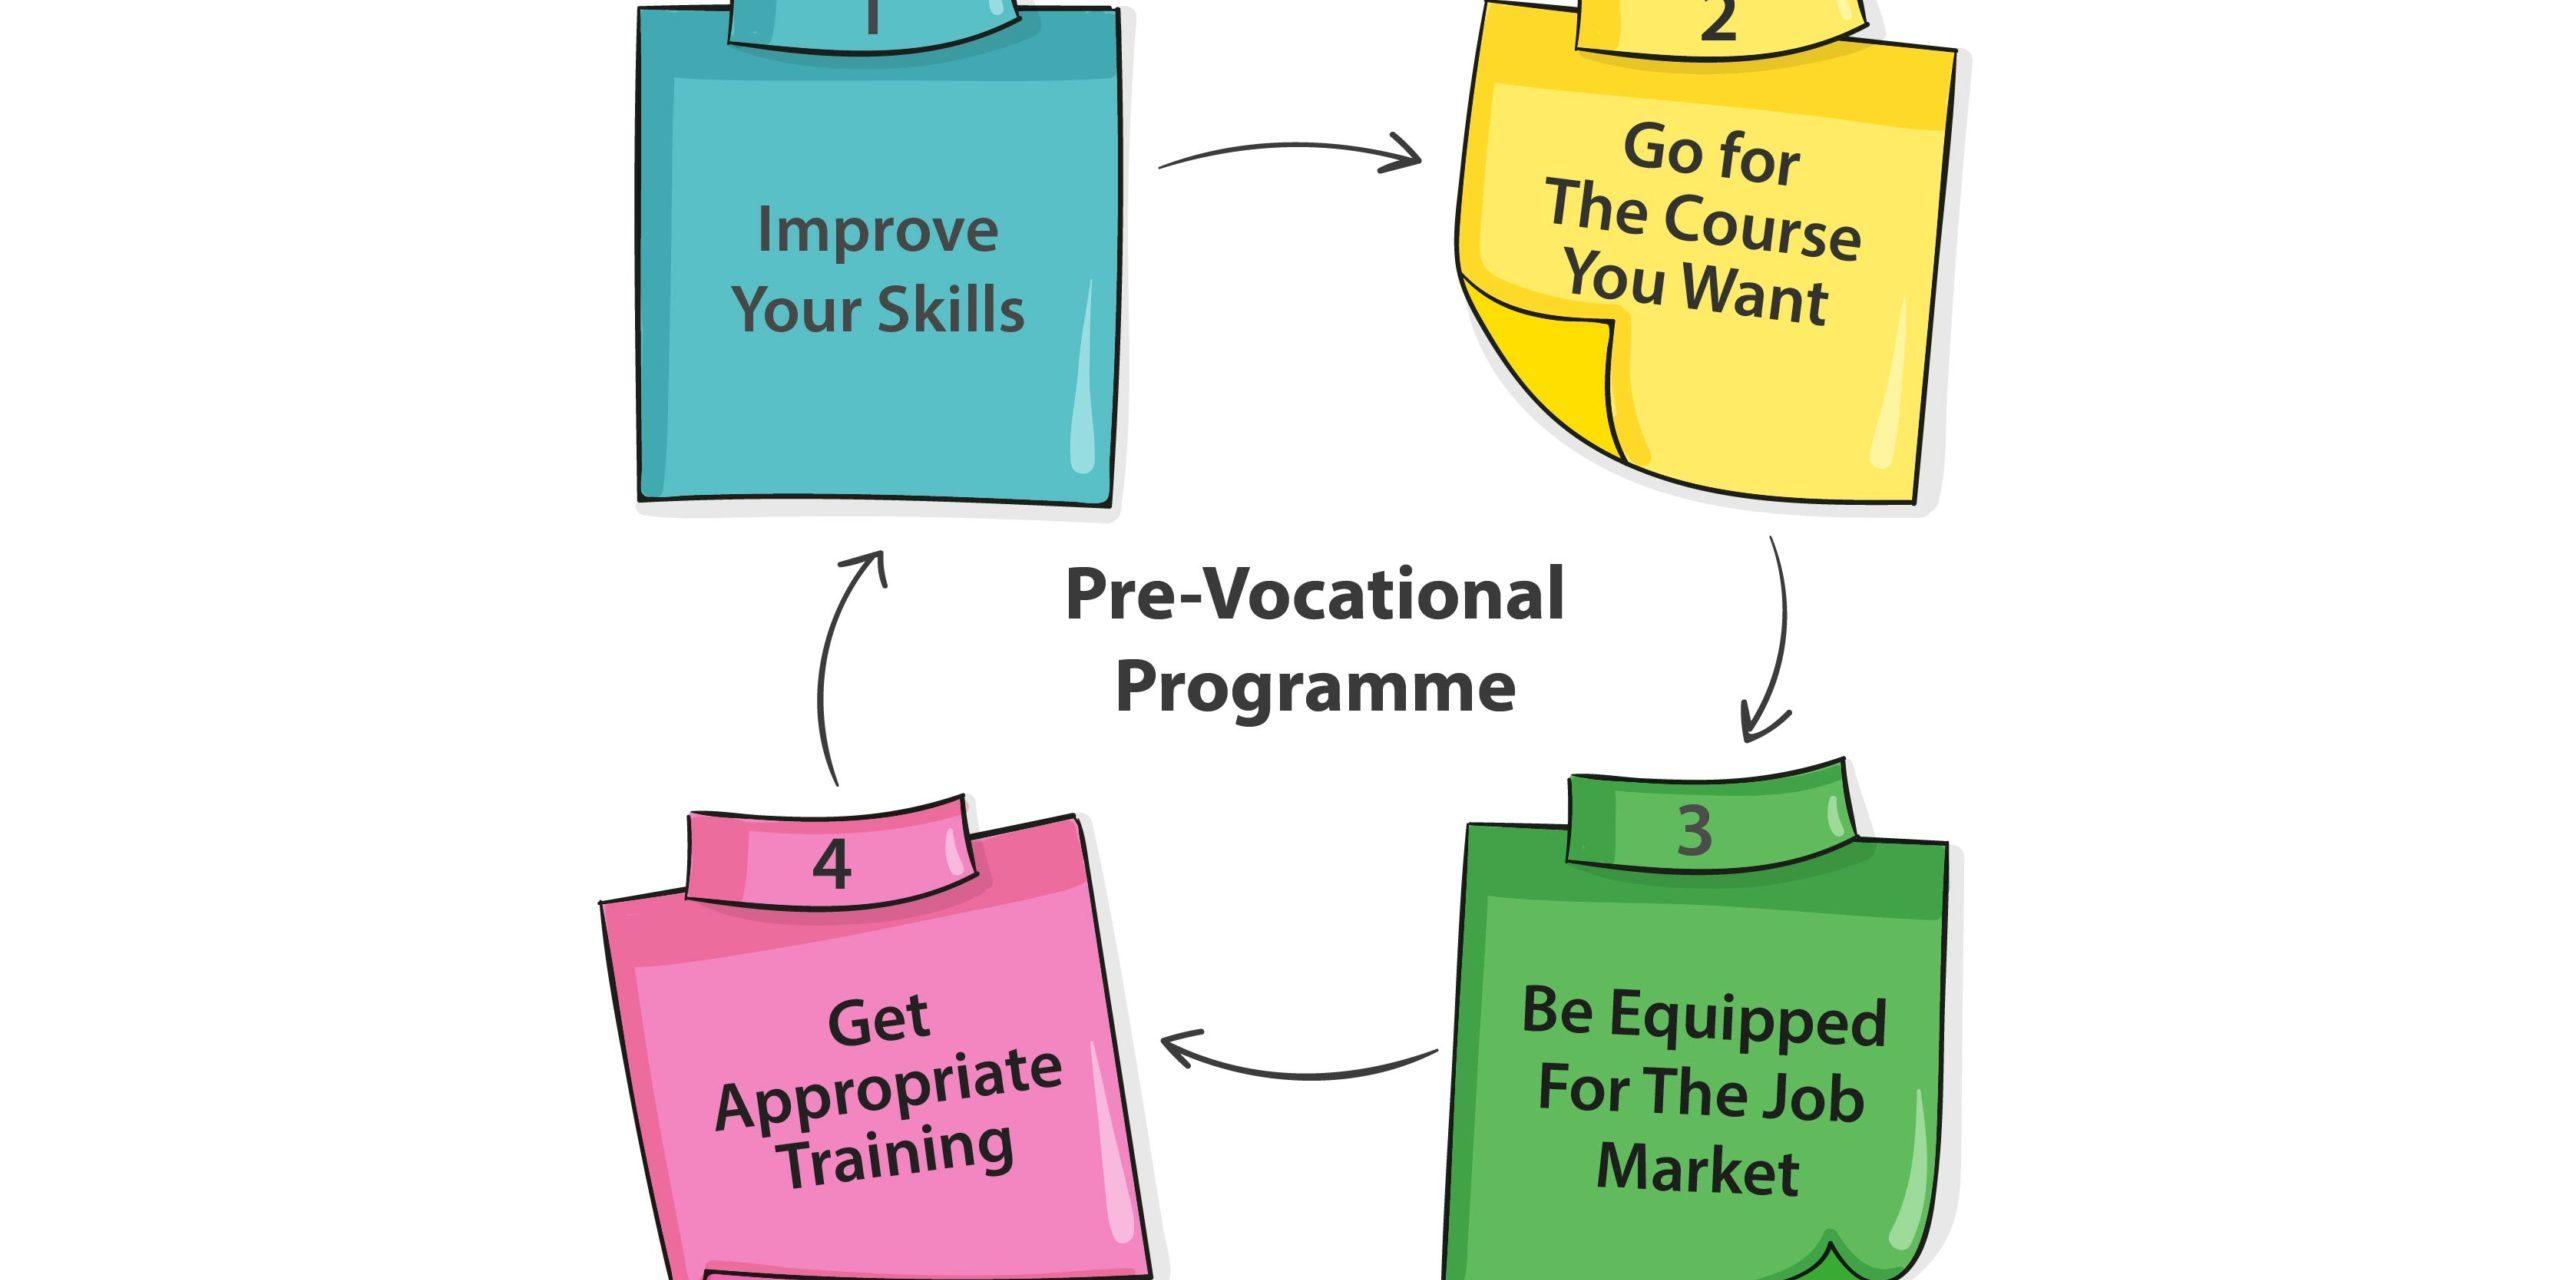 Pre-Vocational Programme